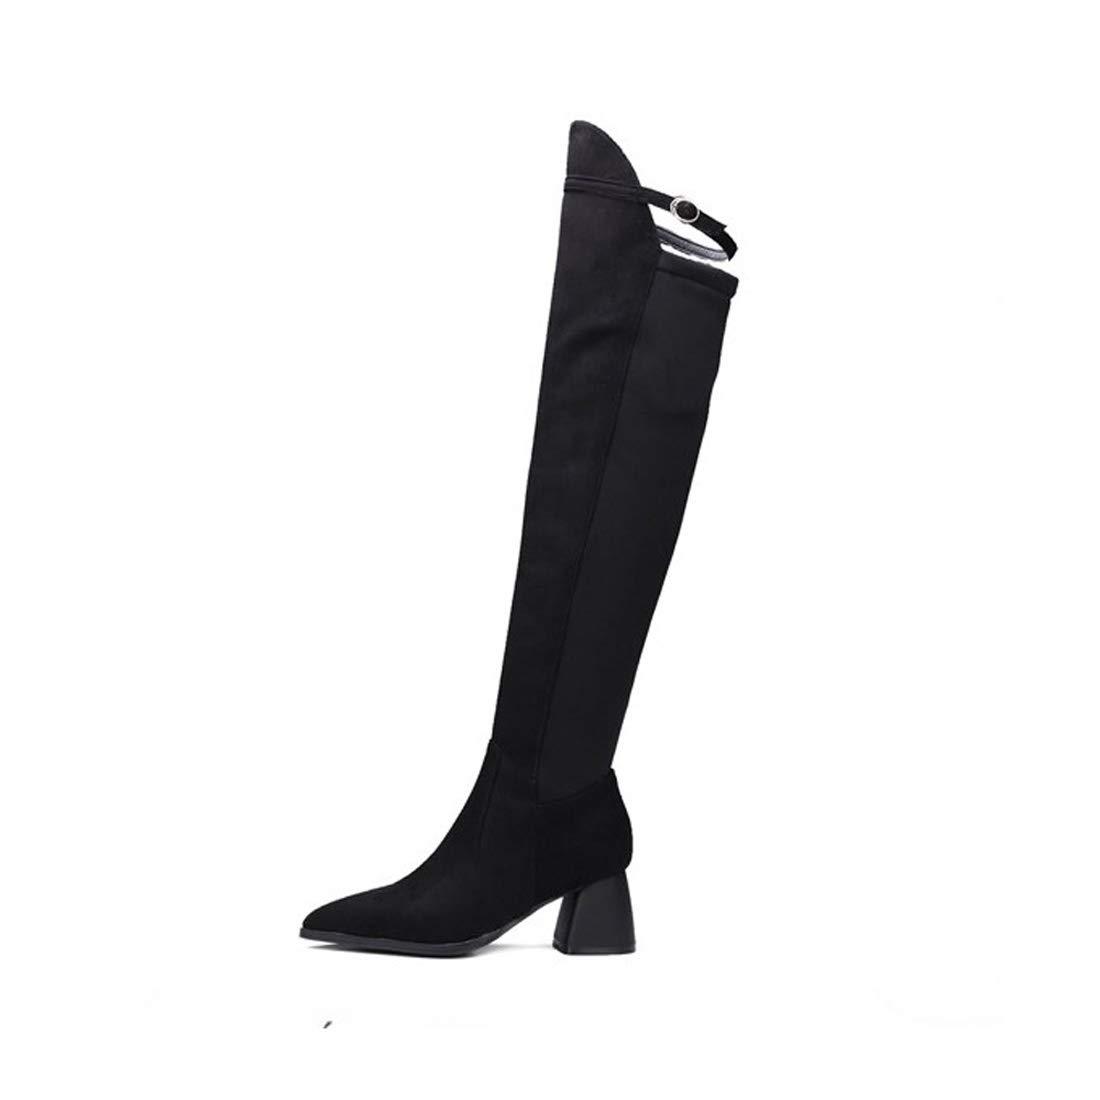 DANDANJIE Damen Stiefel Overknee Stiefel Schnalle Elastische Elastische Elastische Blockabsatz Stiefel 2018 Herbst Winter f12638